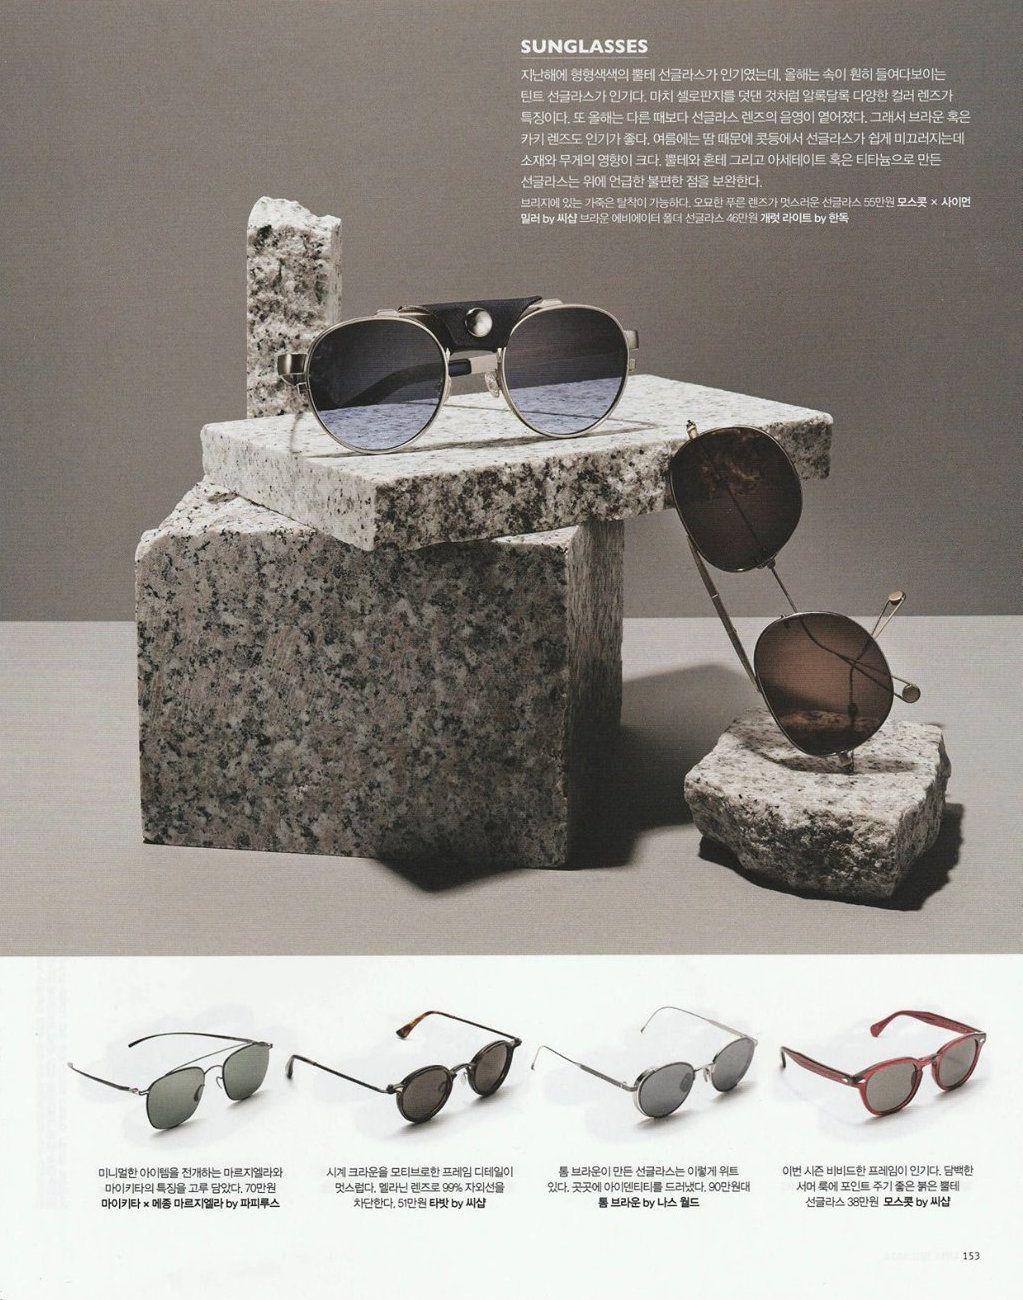 c6e9e6a6461 The MOSCOT X Simon Miller 001 Sunglass gets the spotlight in South Korea's  #LuelMagazine!